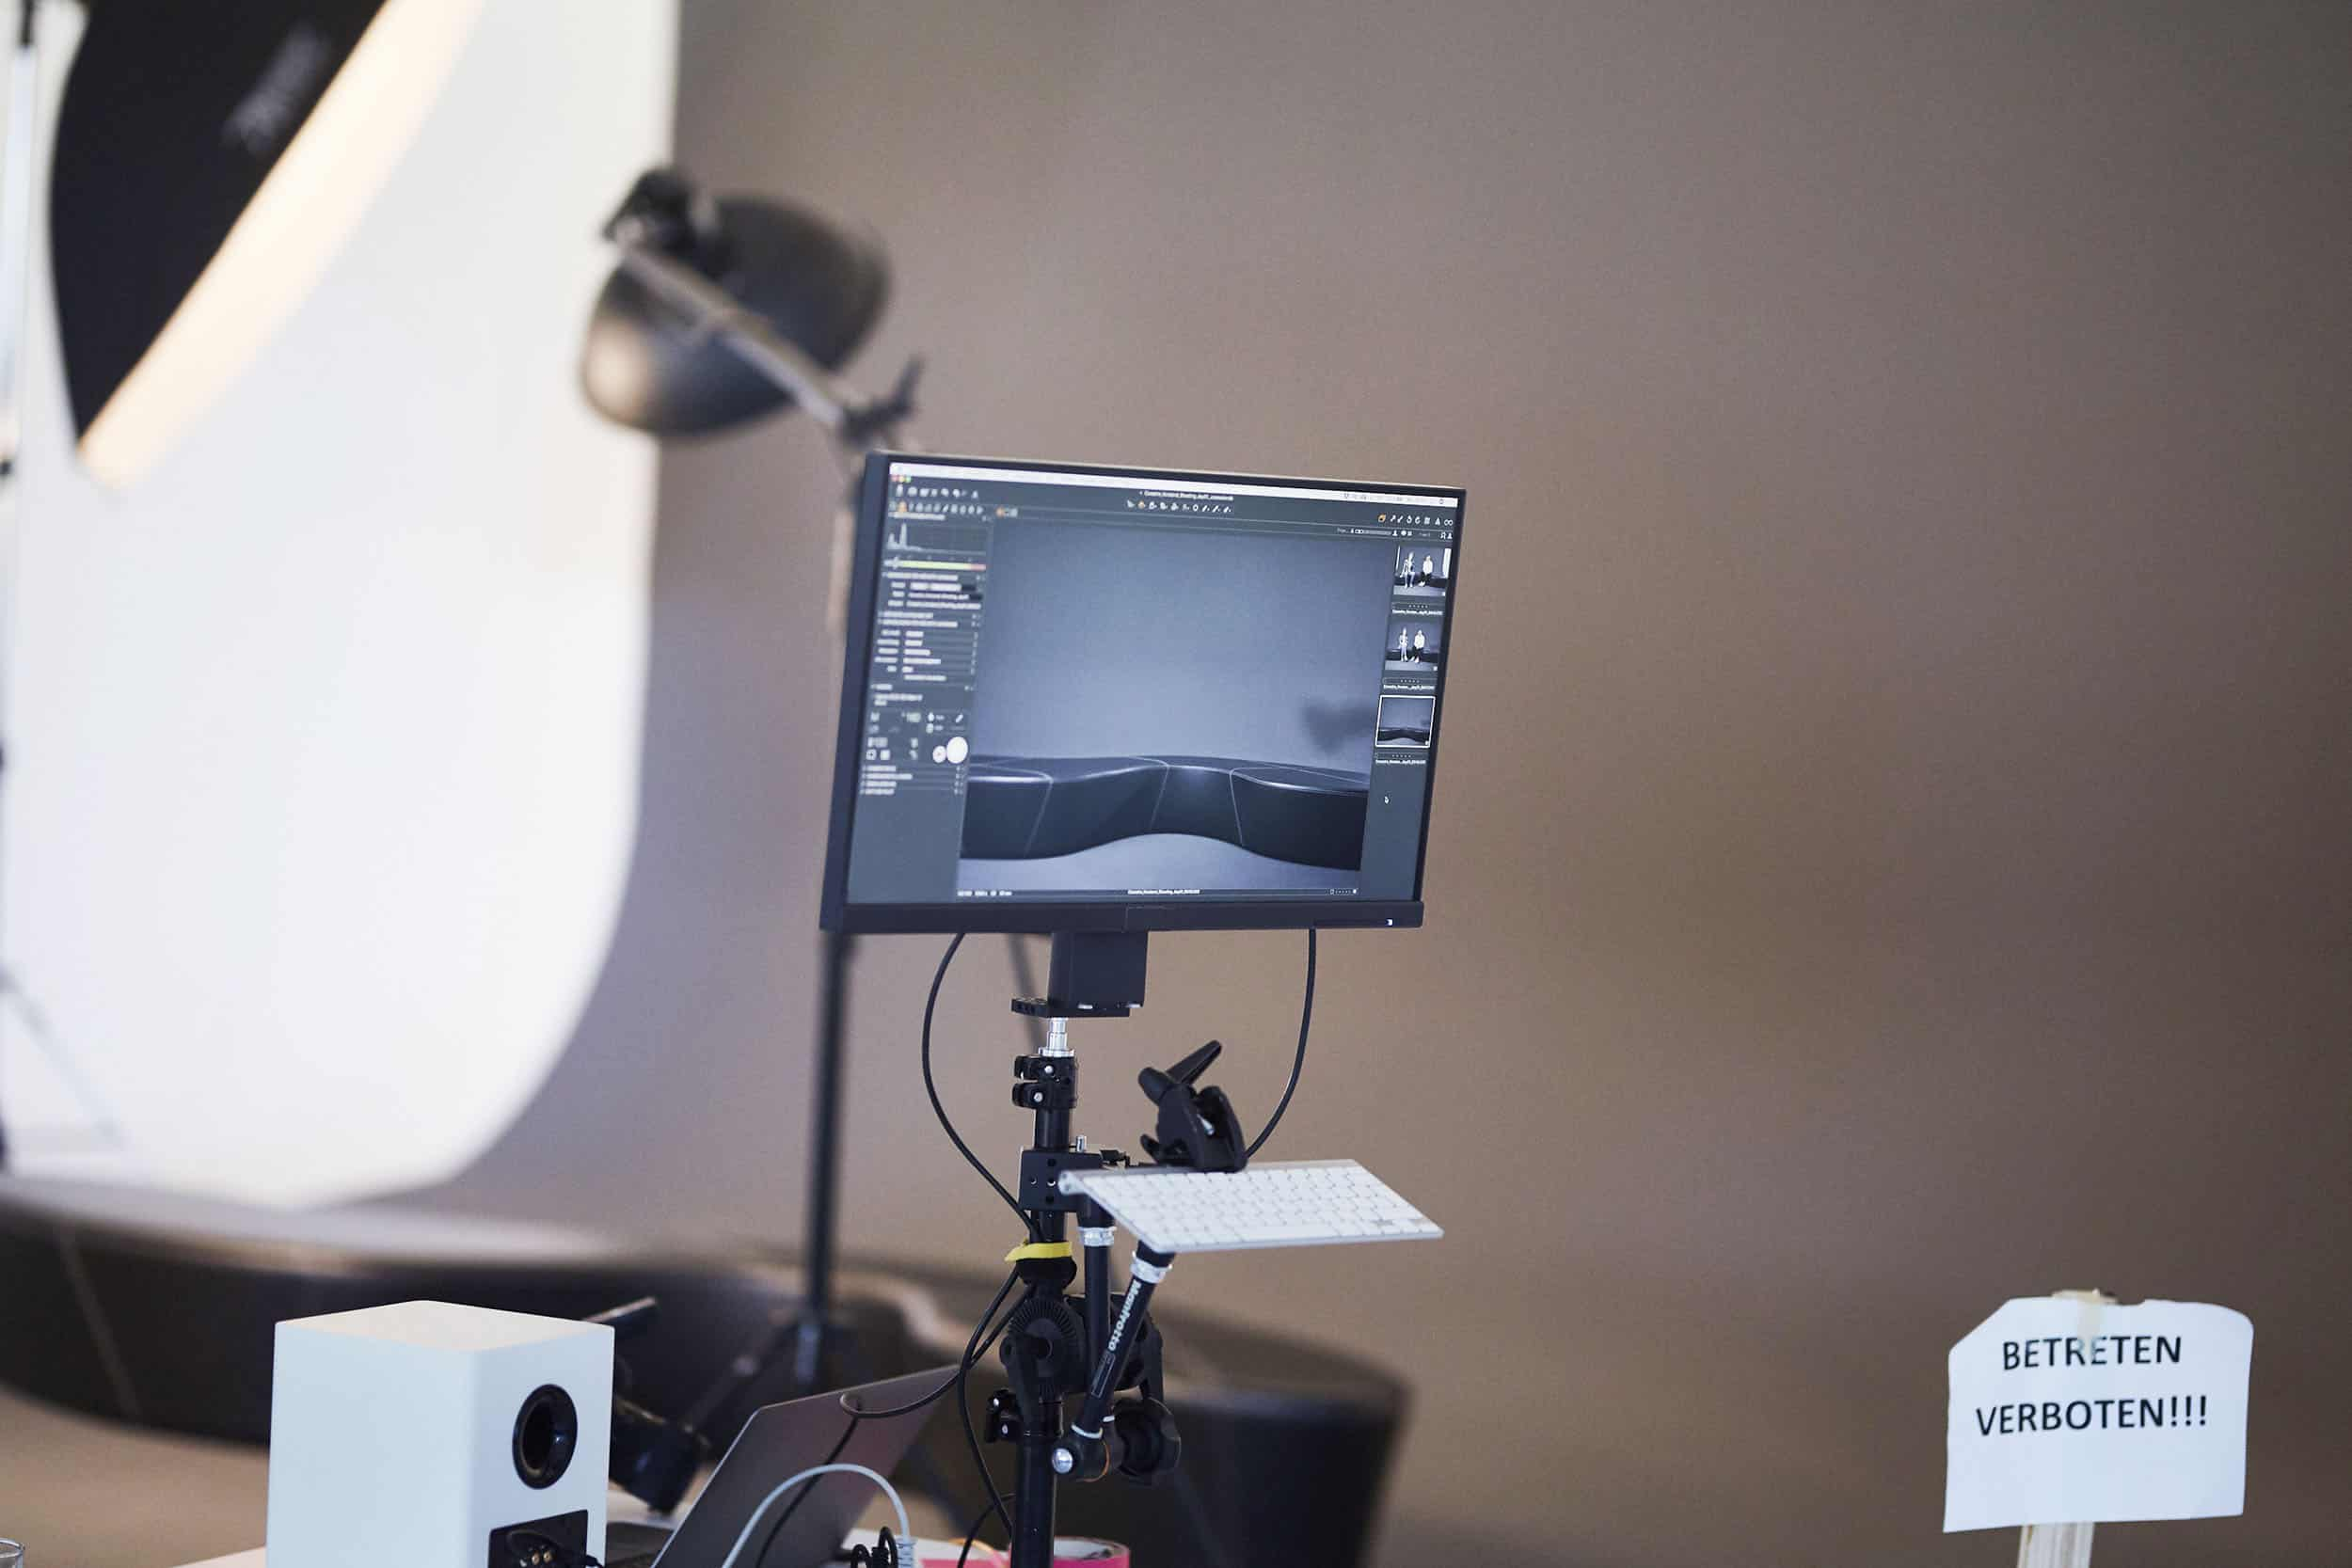 studio-ignatov-covestro-imagekampagne-makingofs-08